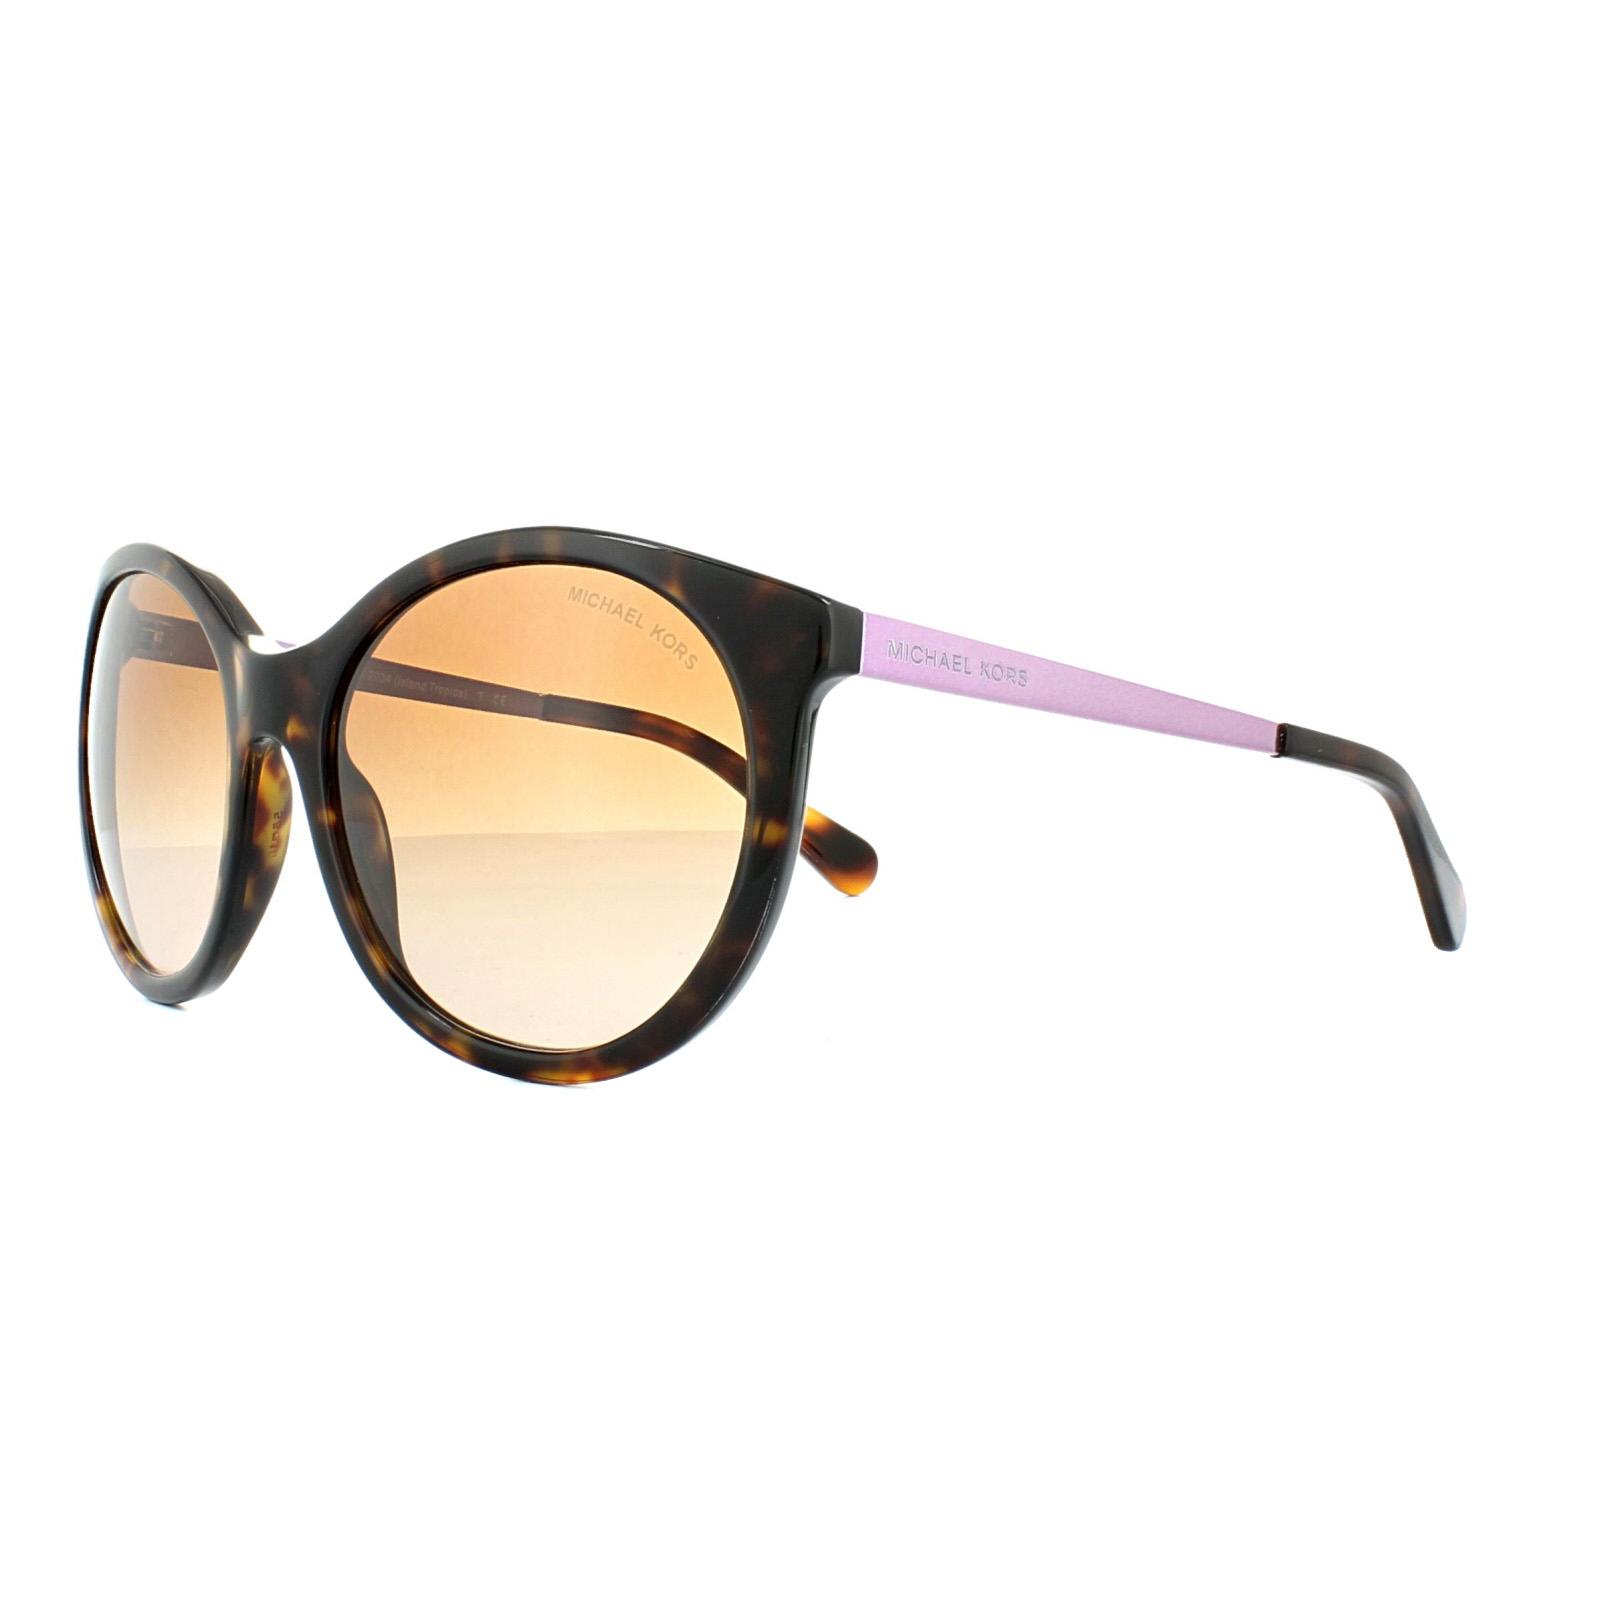 02732d79aca7 Cheap Michael Kors Sunglasses - Discounted Sunglasses